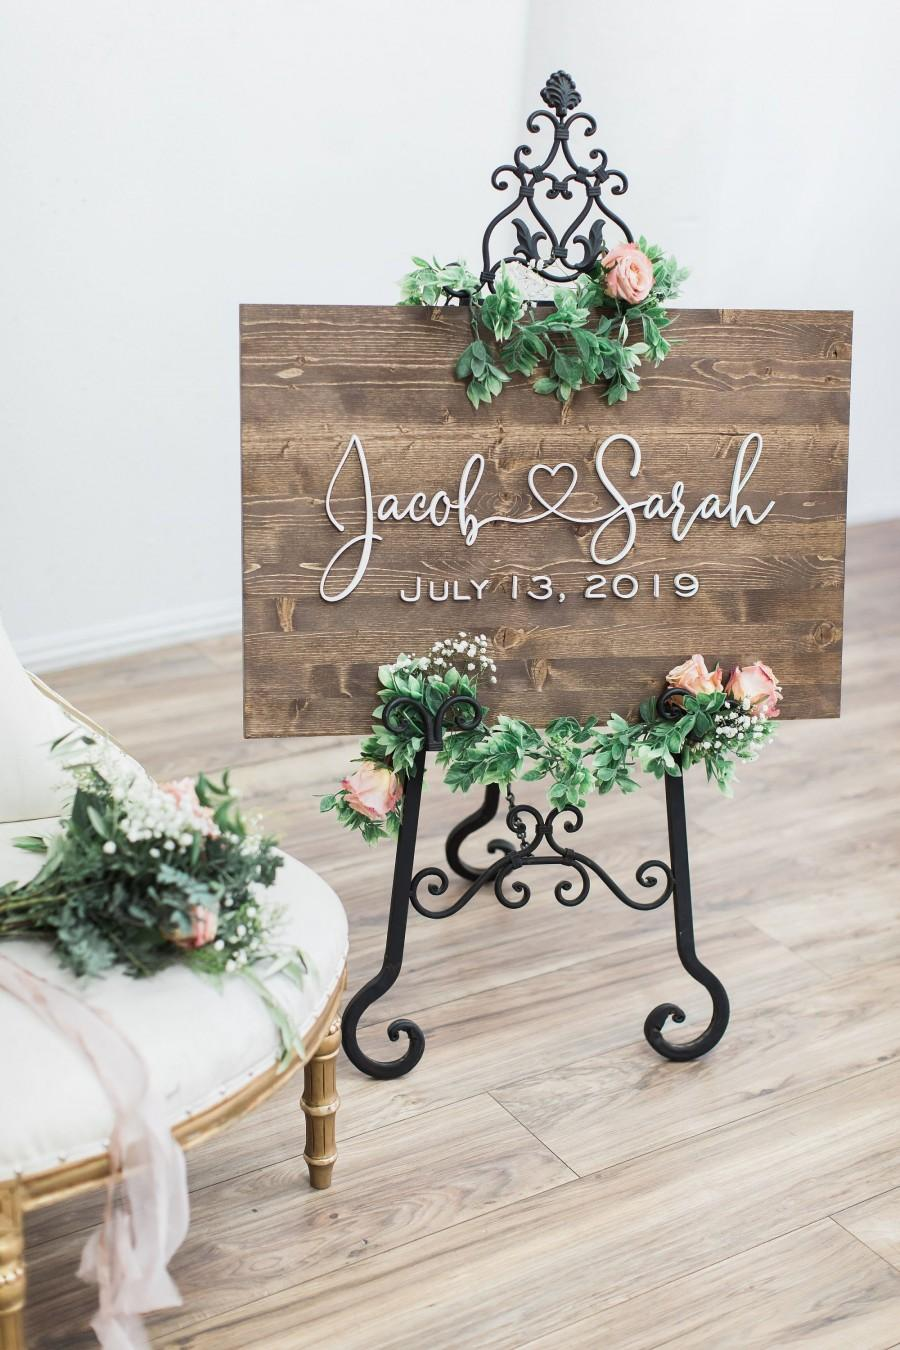 Mariage - Wedding Welcome Sign, Wedding Sign, Rustic Wood Sign, Wedding Signage, Wedding Name Sign, Wood Wedding Sign, Custom Wedding Sign, Name Sign